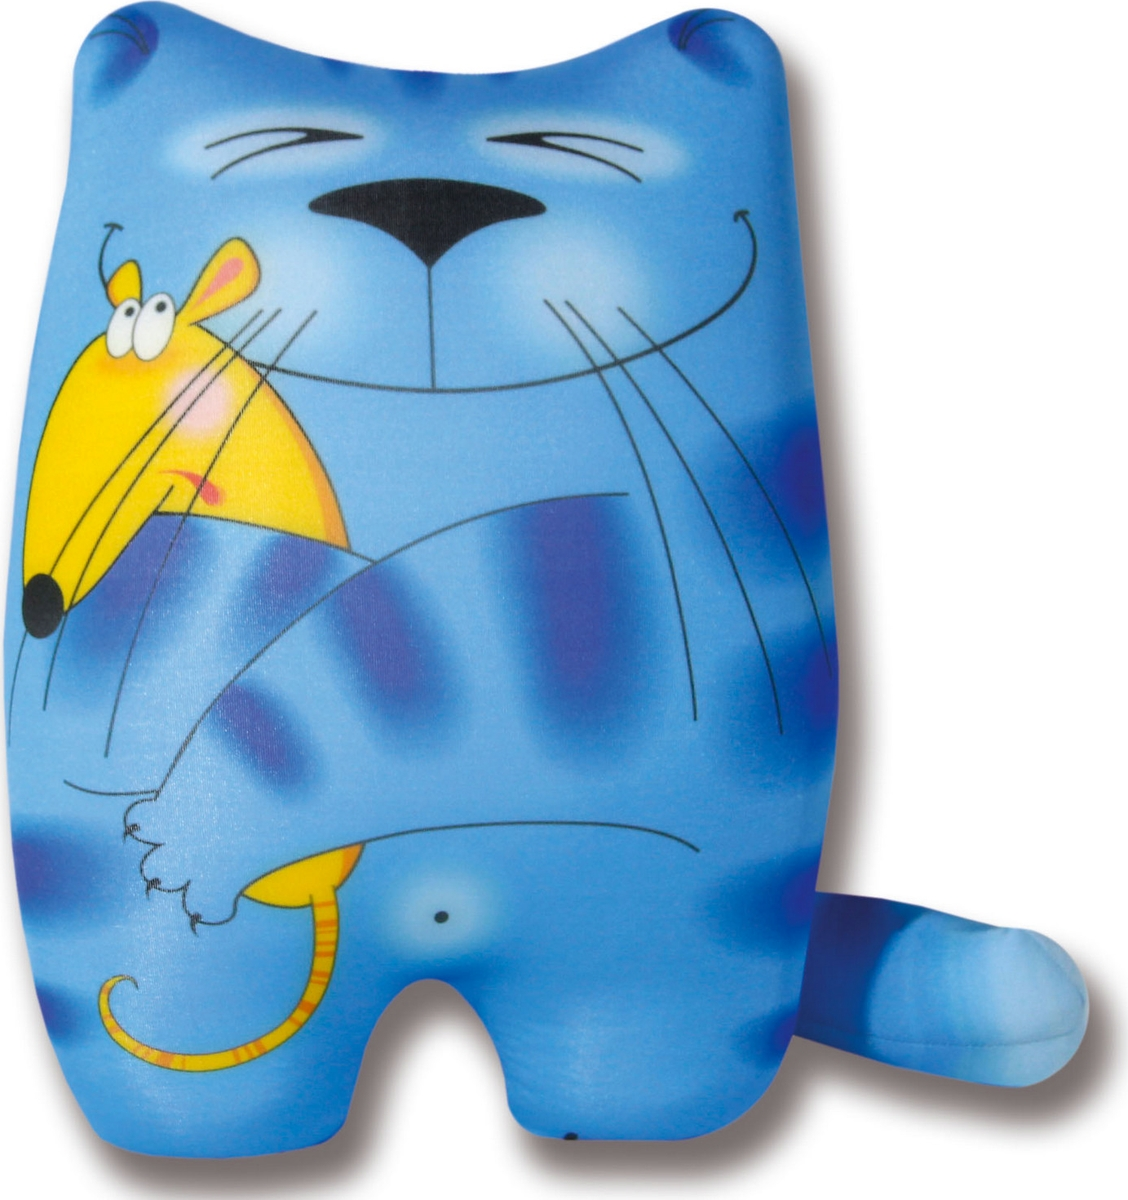 Подушка-игрушка антистрессовая Кошки Мышки, голубой